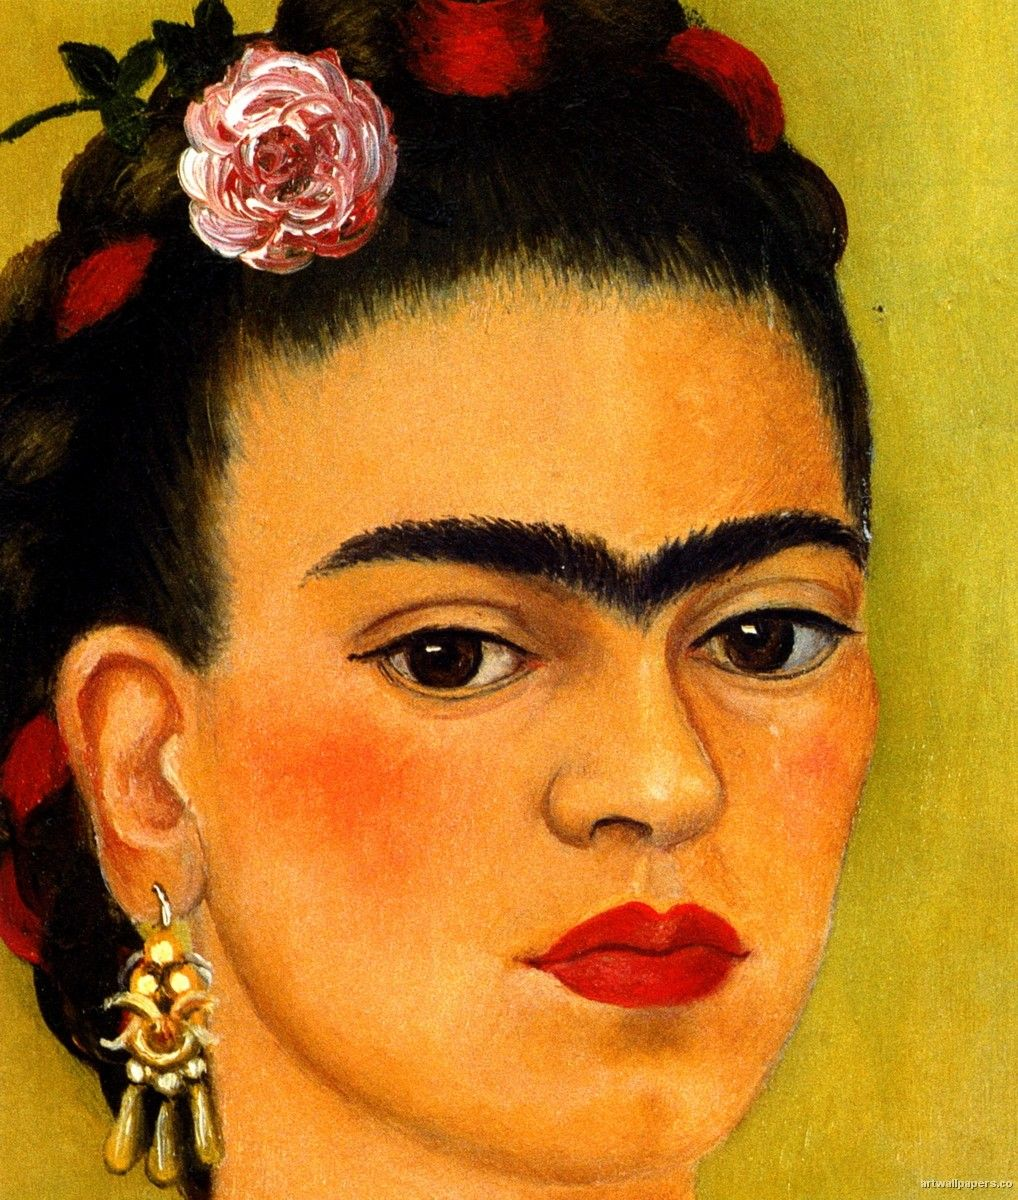 frida kahlo artwork frida kahlo paintings 106 art oil paintings artworks. Black Bedroom Furniture Sets. Home Design Ideas